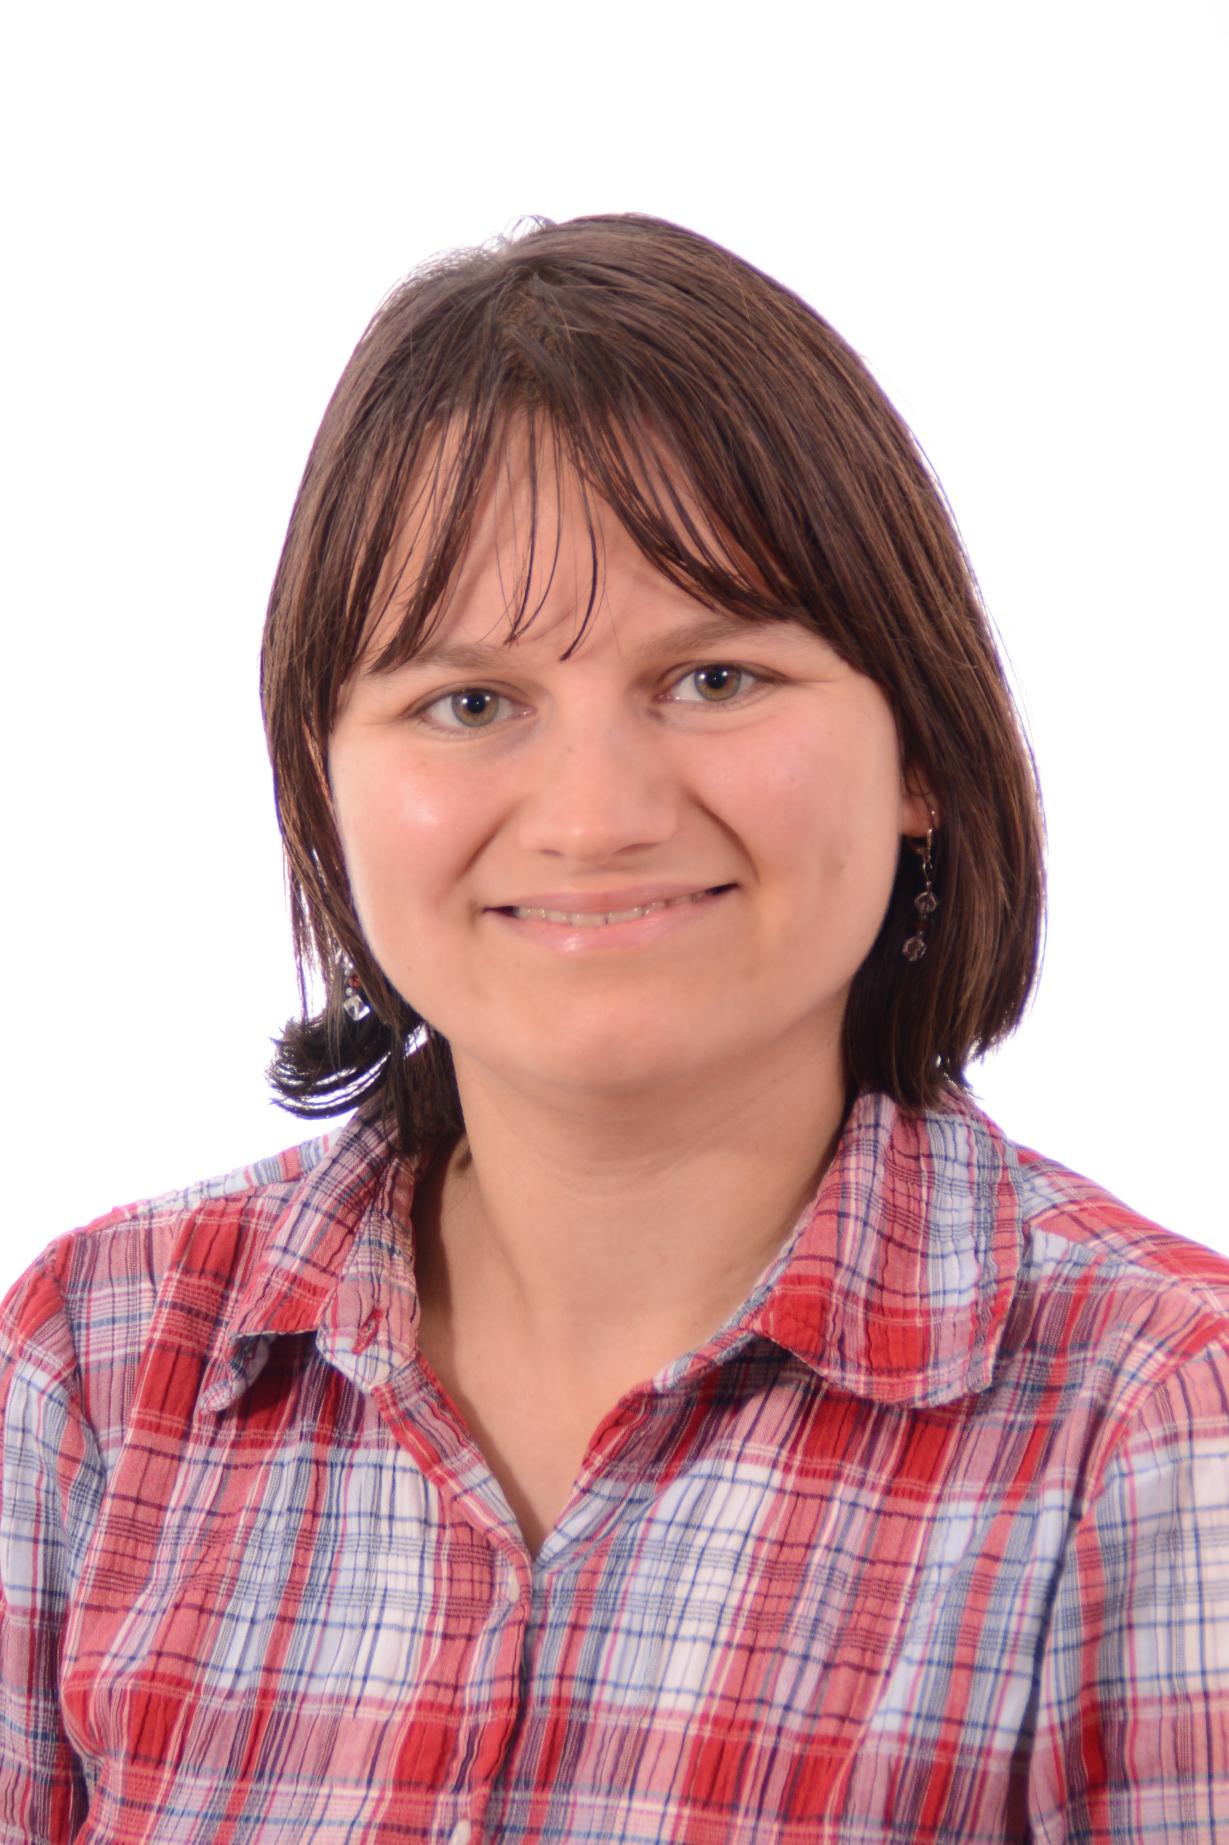 Hurle, Katrin